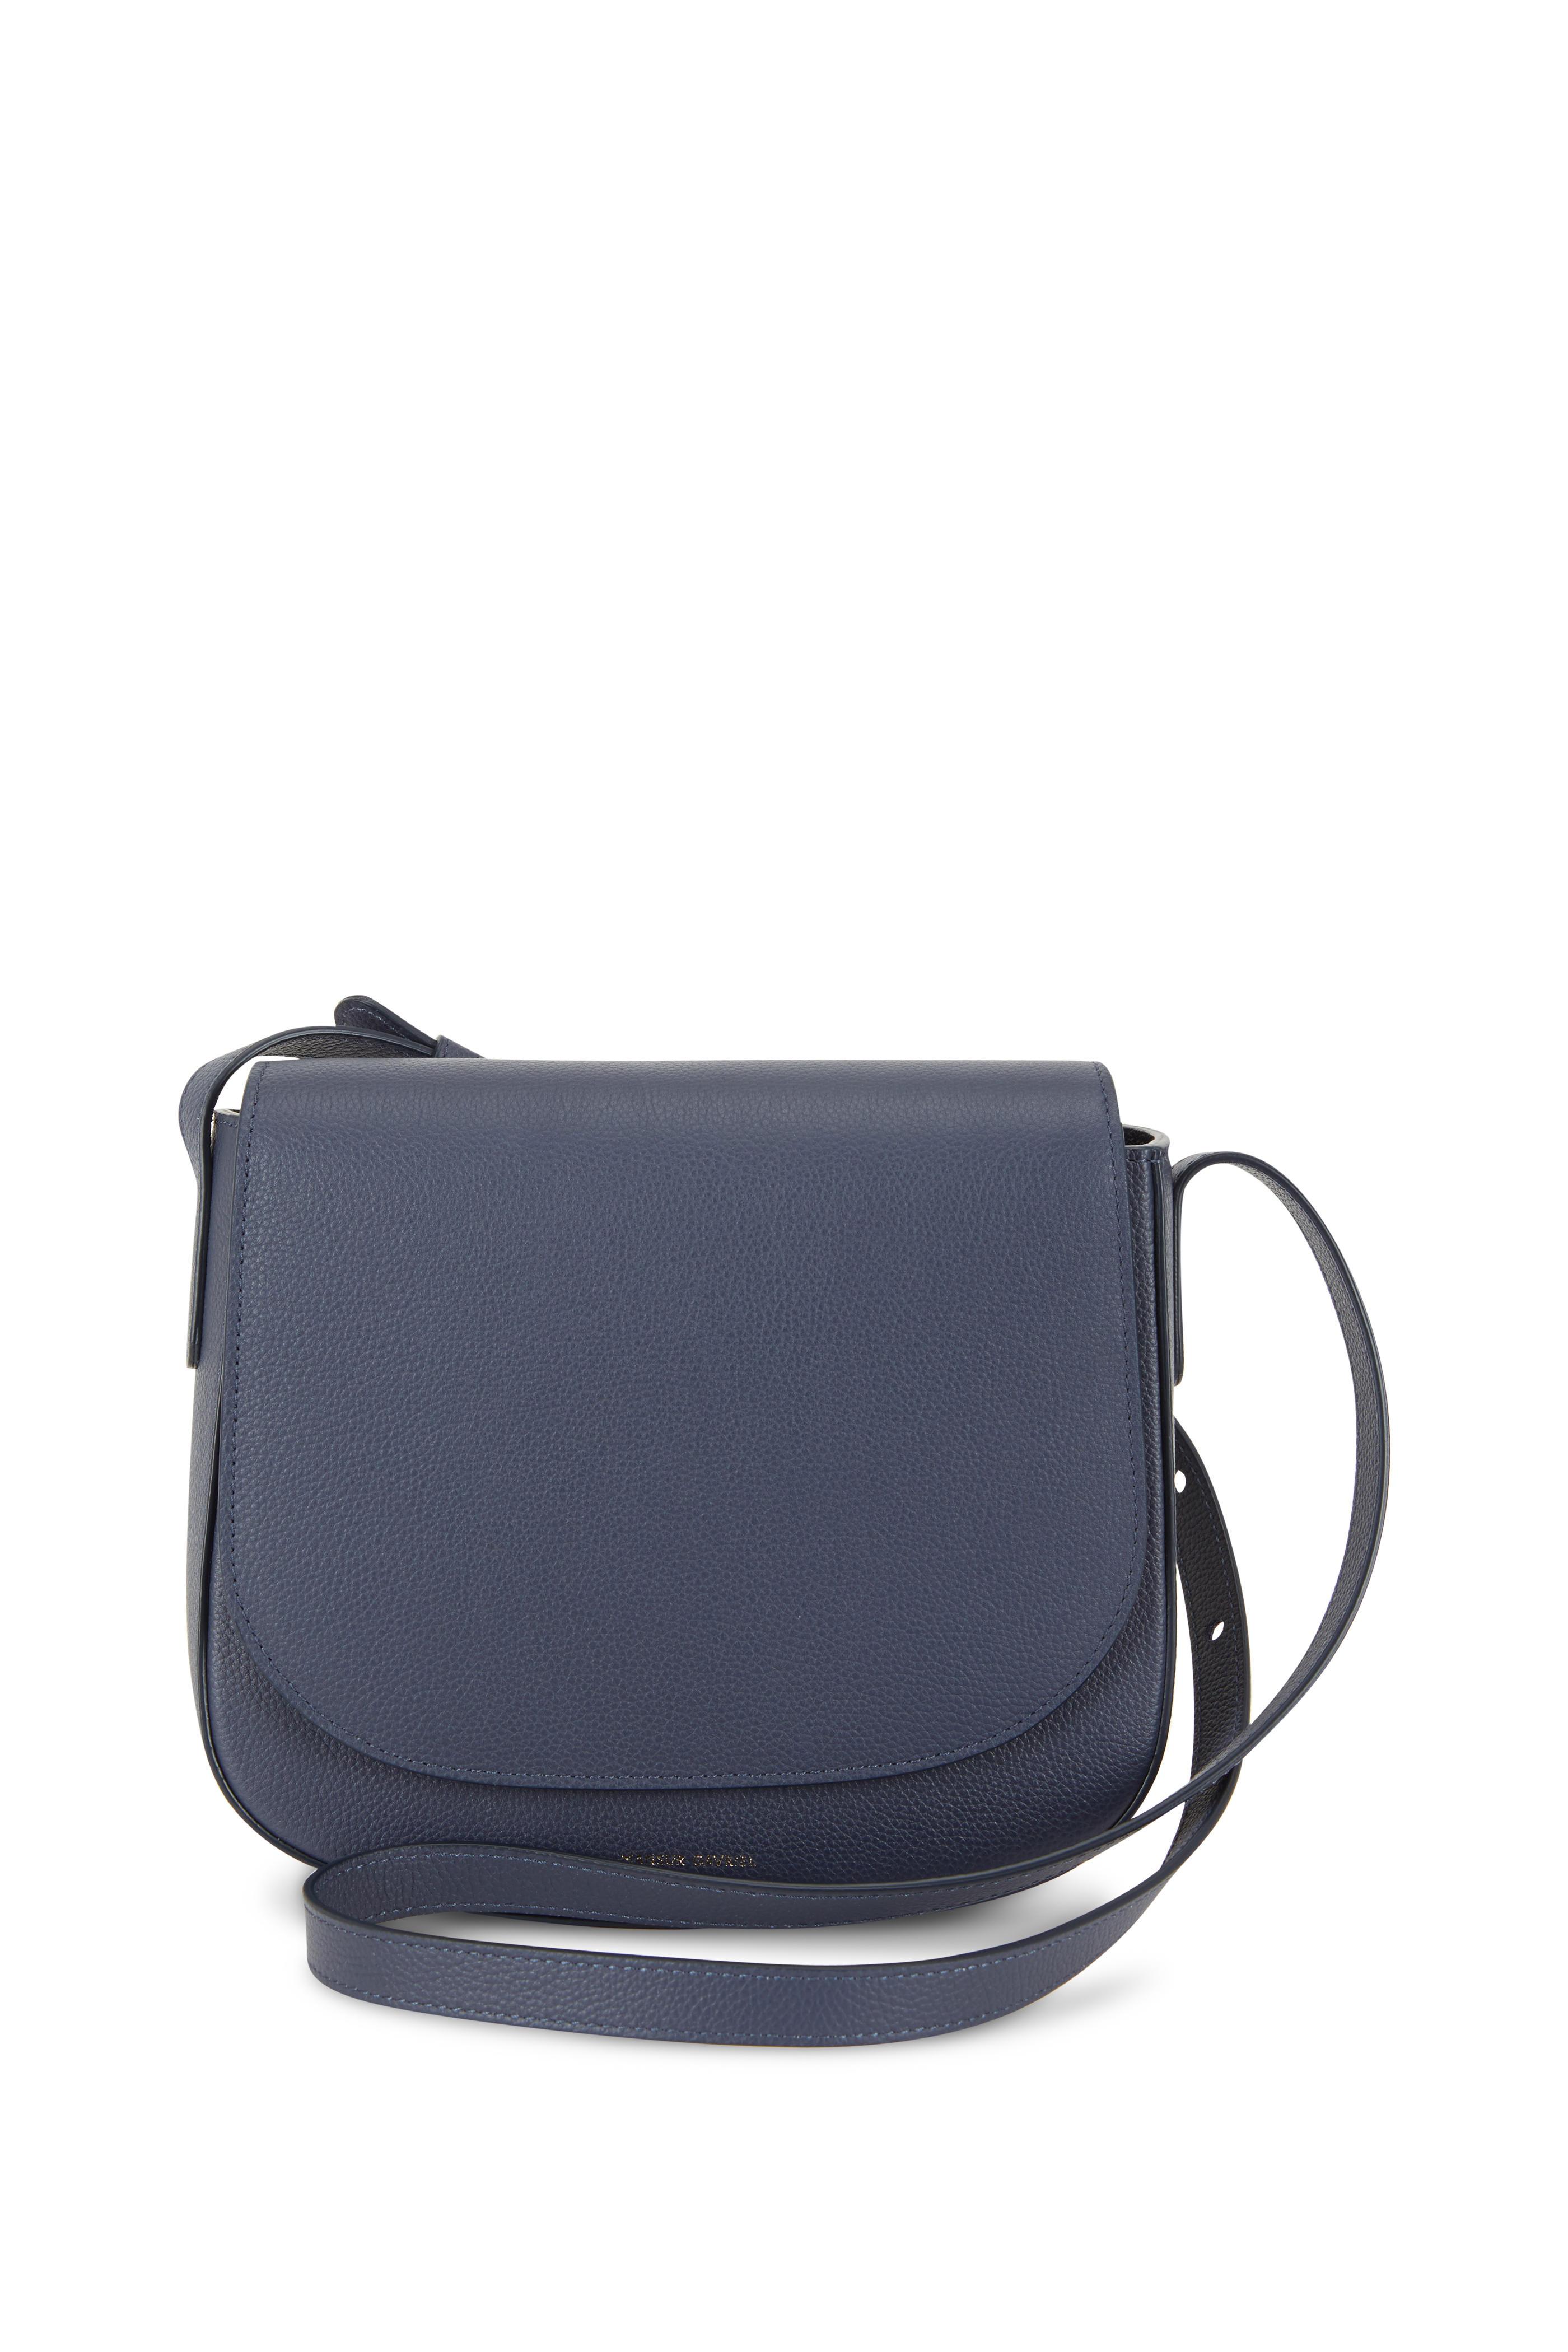 8f2657f3f004e Mansur Gavriel - Navy Blue Pebbled Leather Crossbody Bag   Mitchell ...